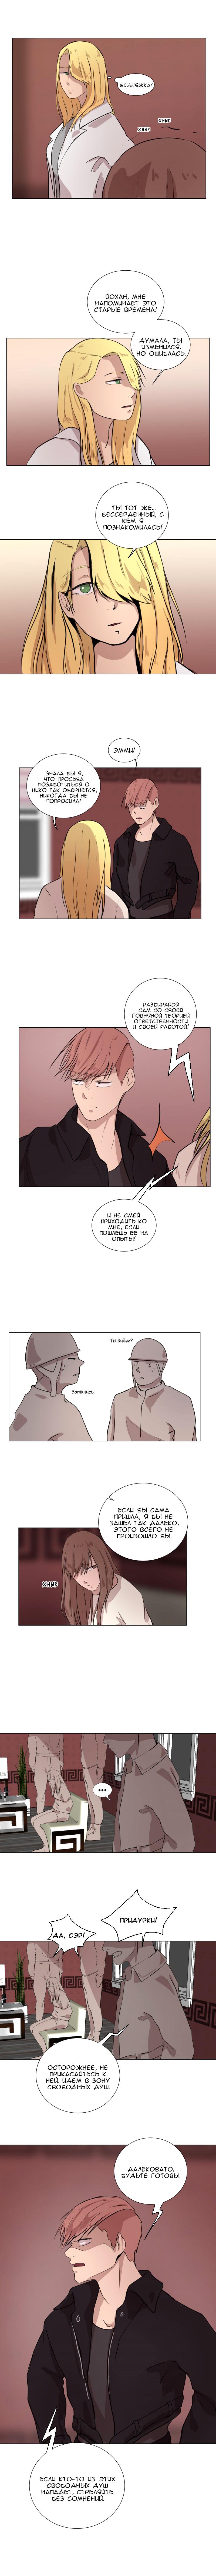 https://r1.ninemanga.com/comics/pic2/58/31802/416849/1533716865262.jpg Page 6